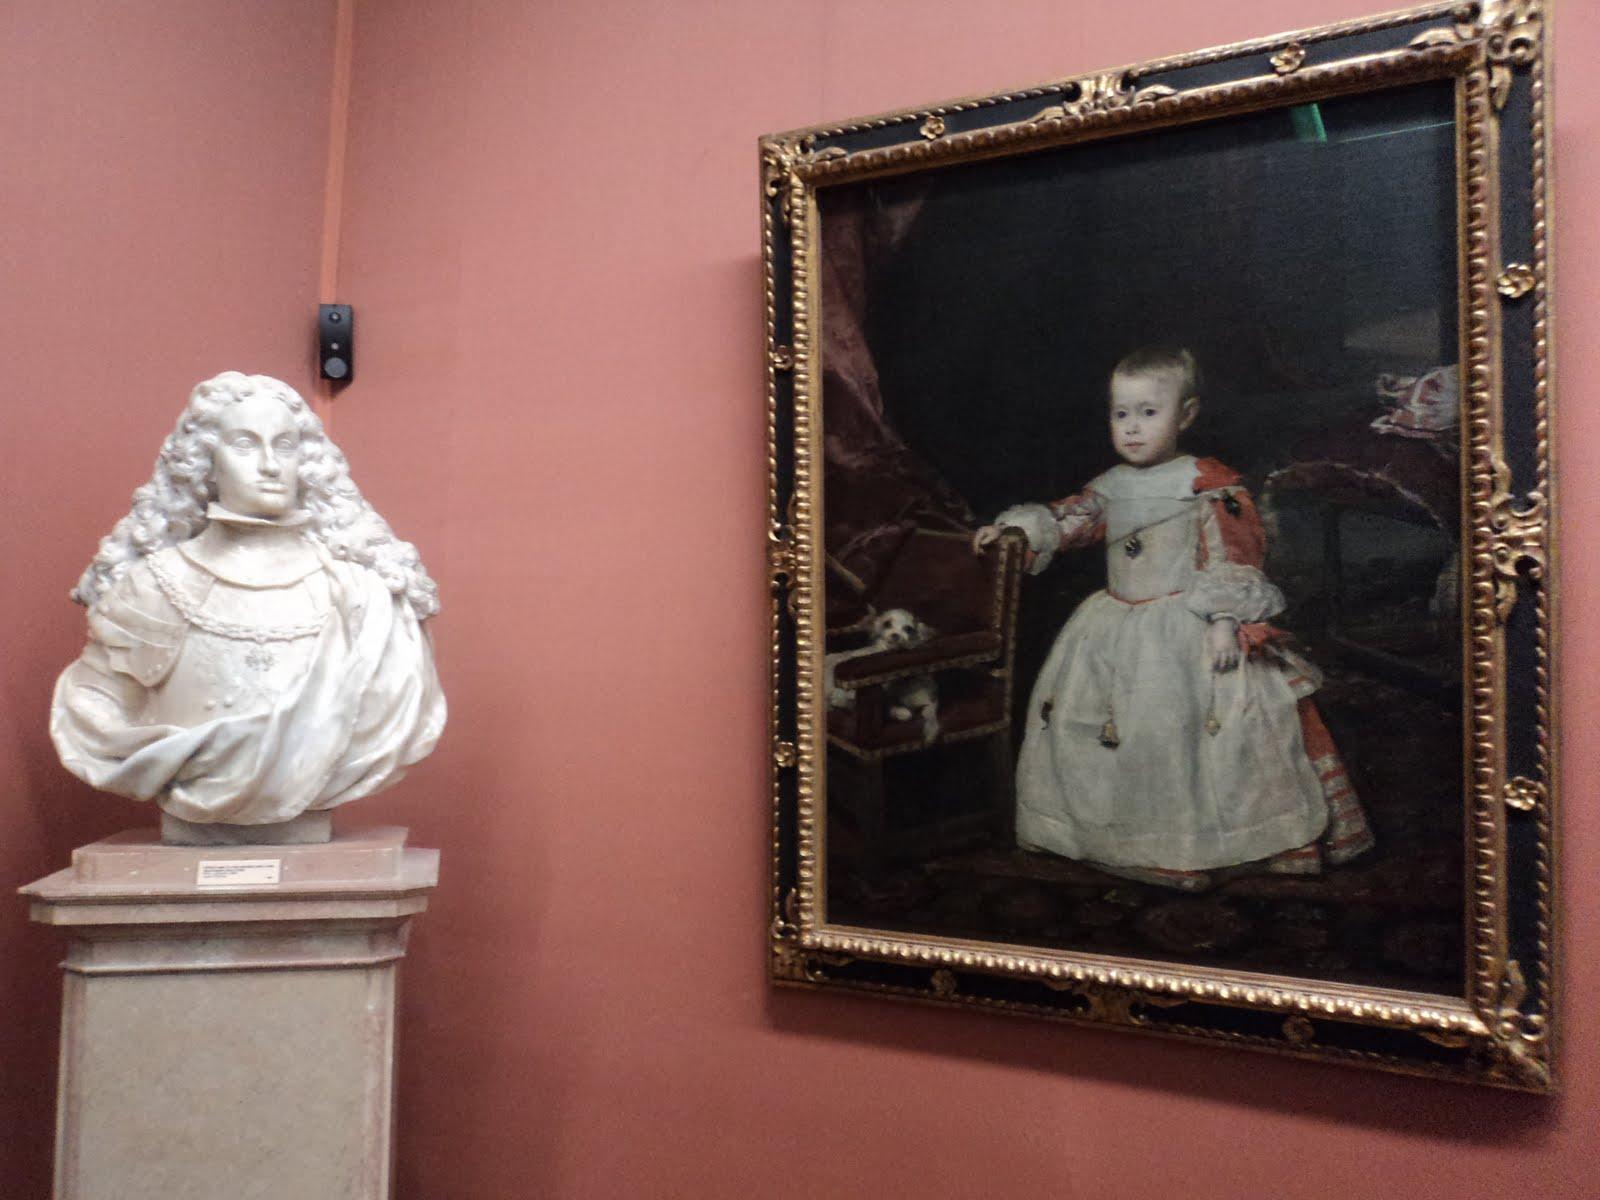 transcurso del siglo XVI, fundamentalmente bajoel reinado de Felipe II ...